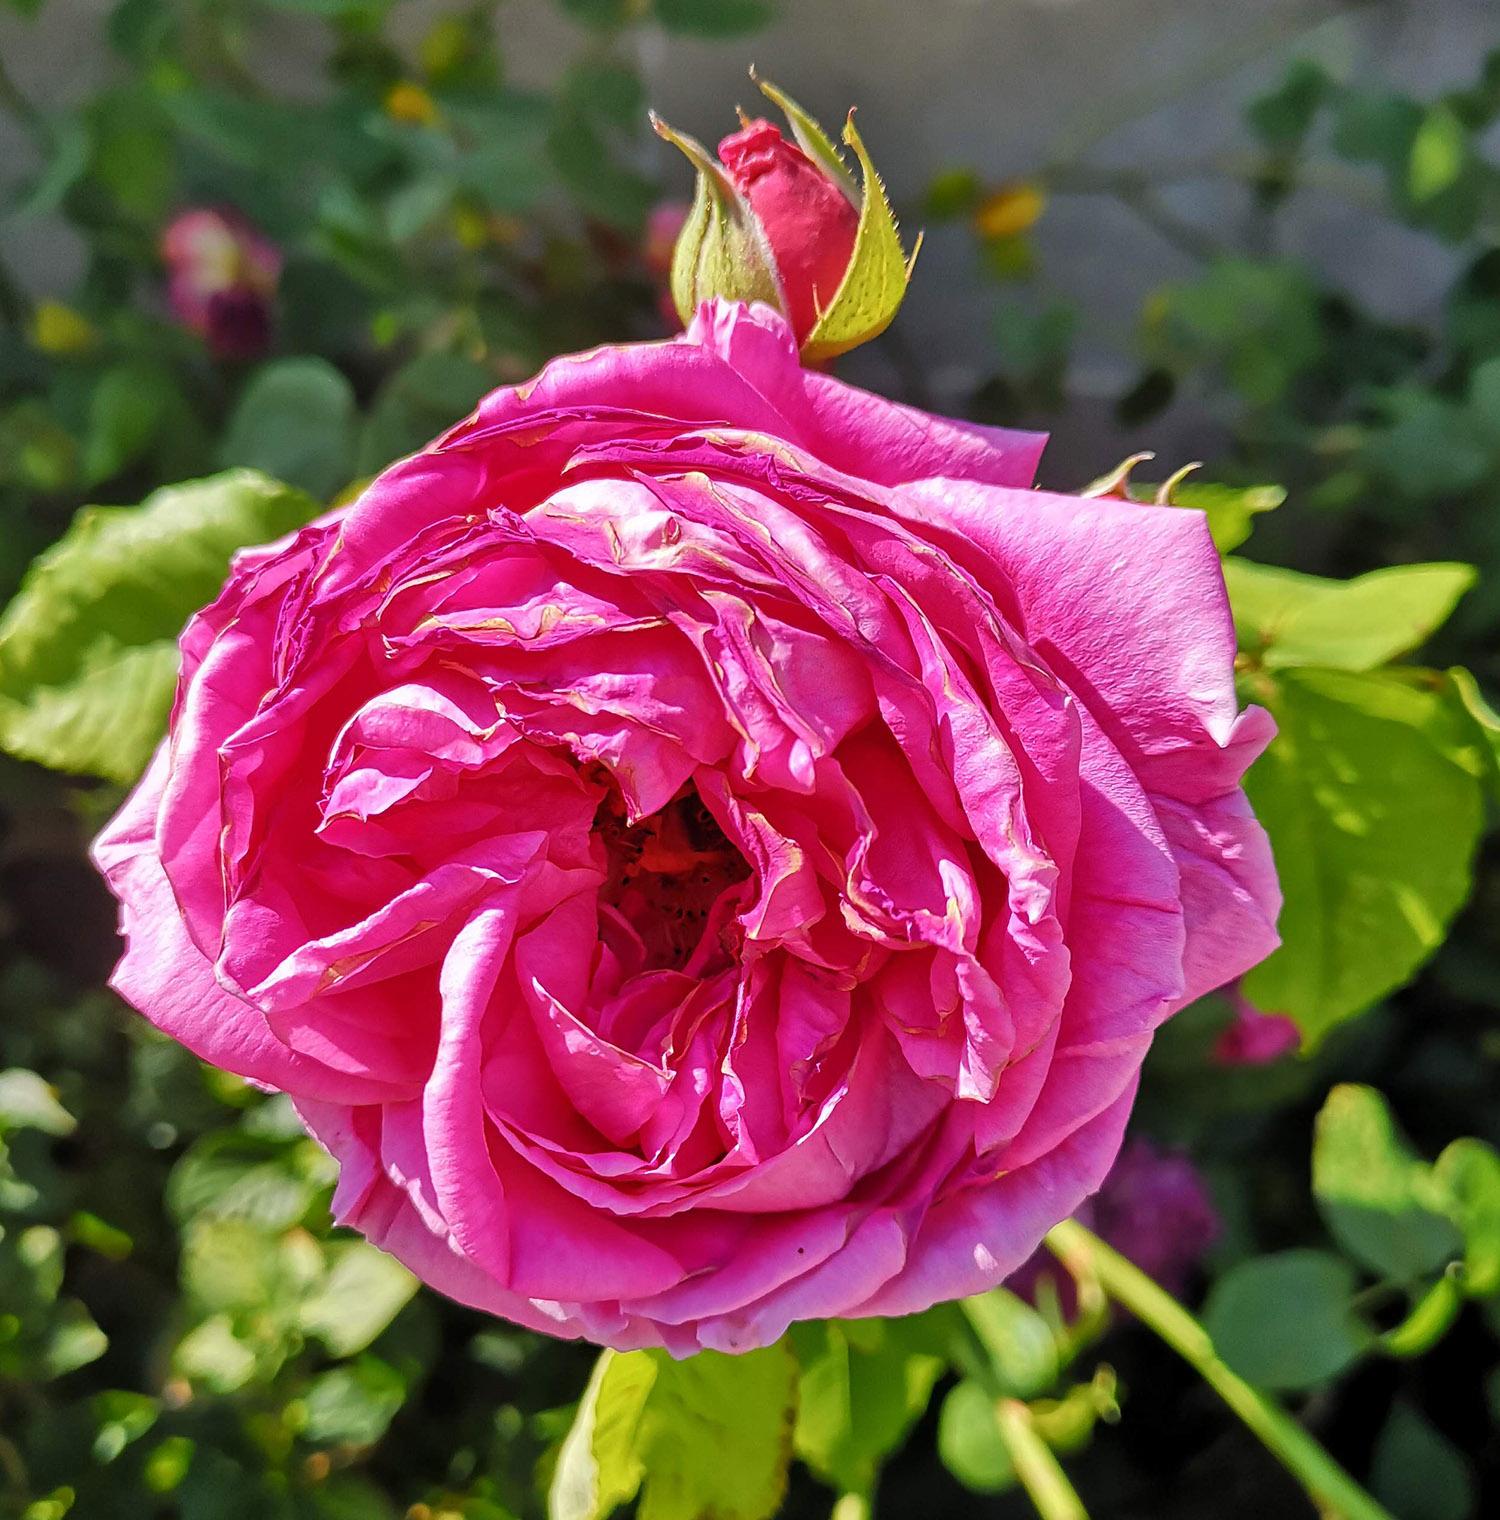 Abbotsford gardens deep pink rose.jpg